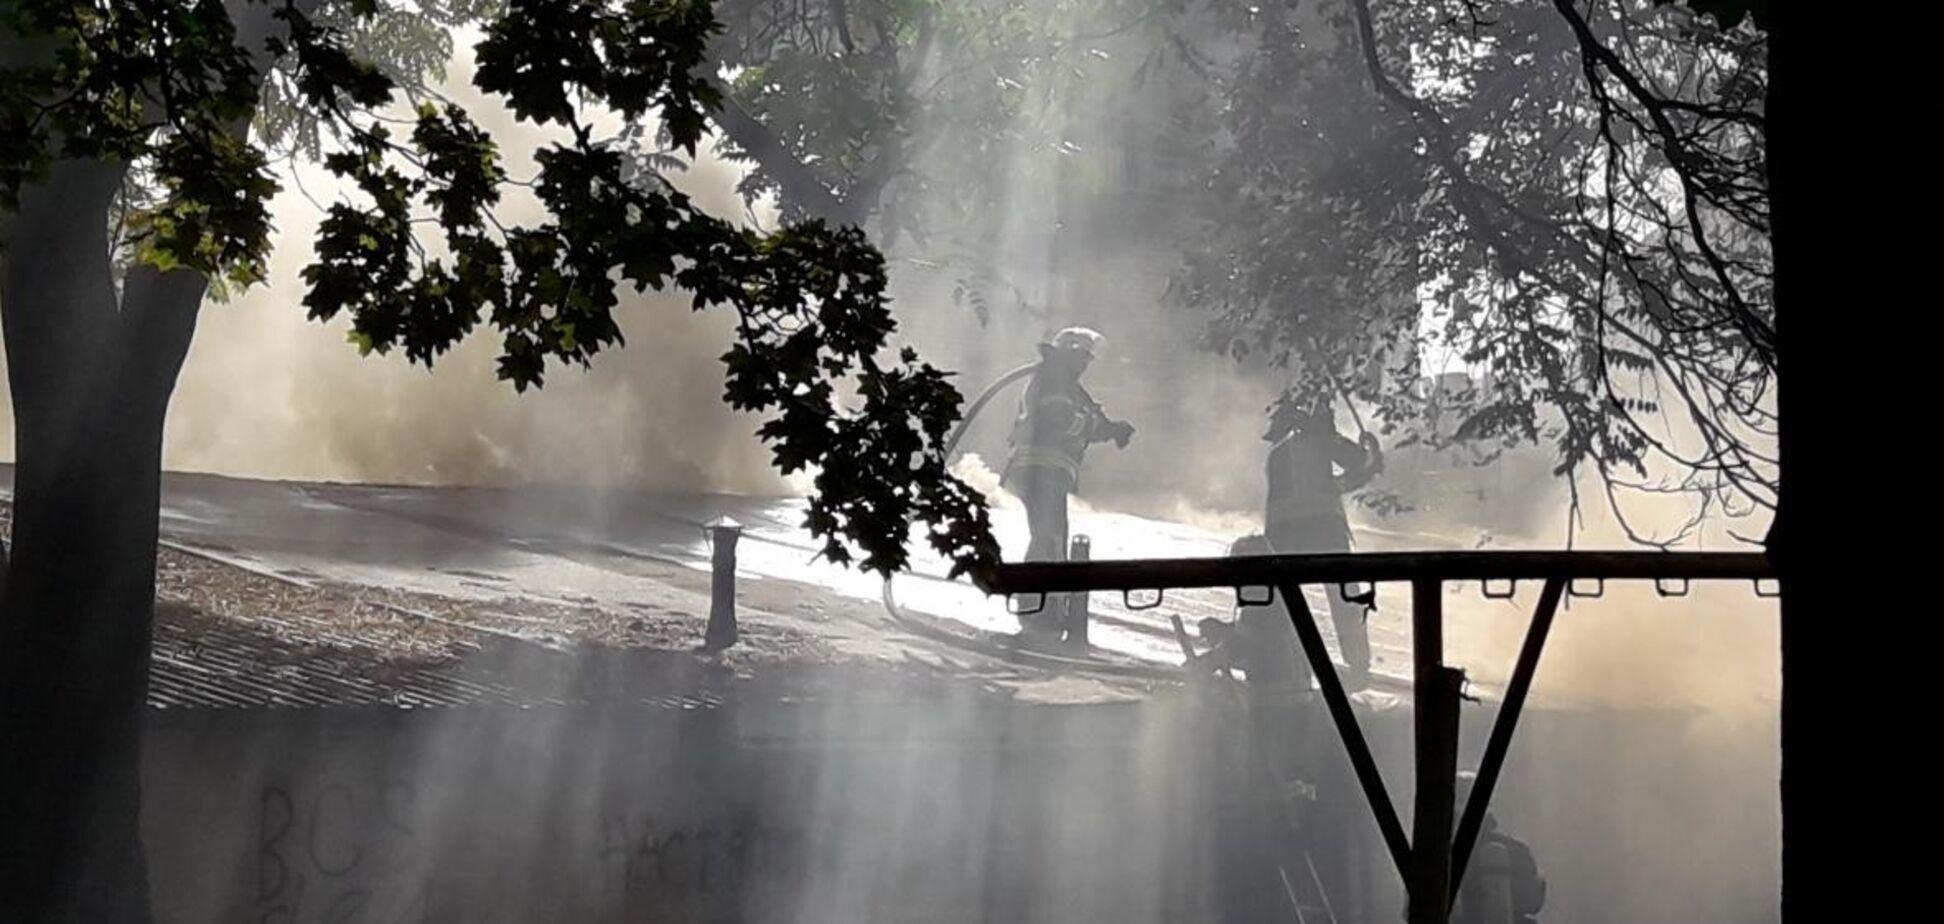 В центре Запорожья бушевал пожар